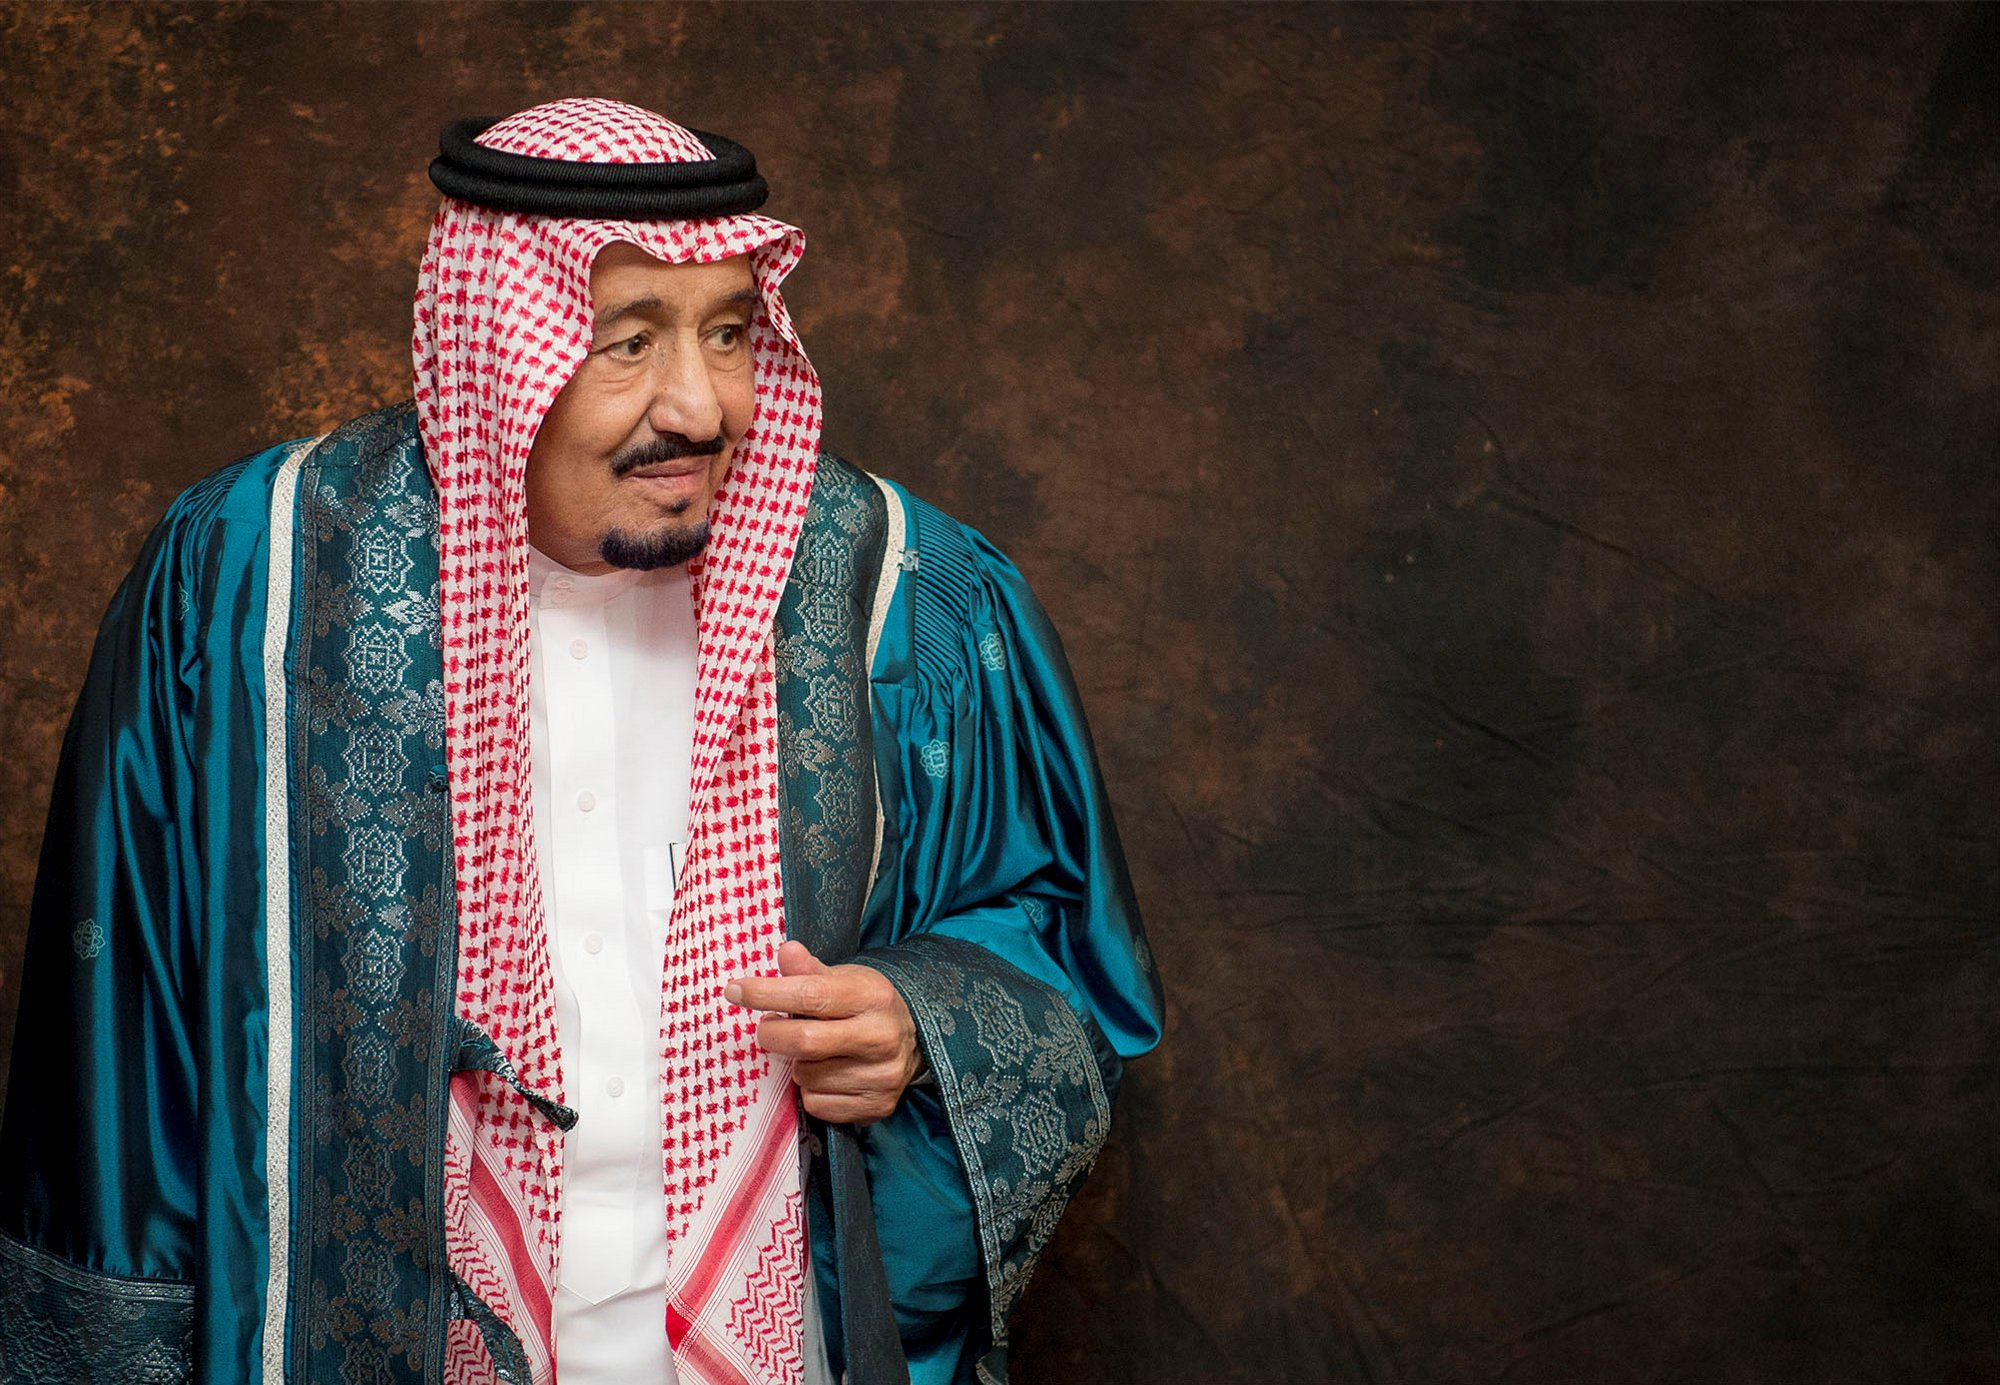 بالصور صور للملك سلمان , صور مميزه ومنوعه للملك سلمان 4022 10